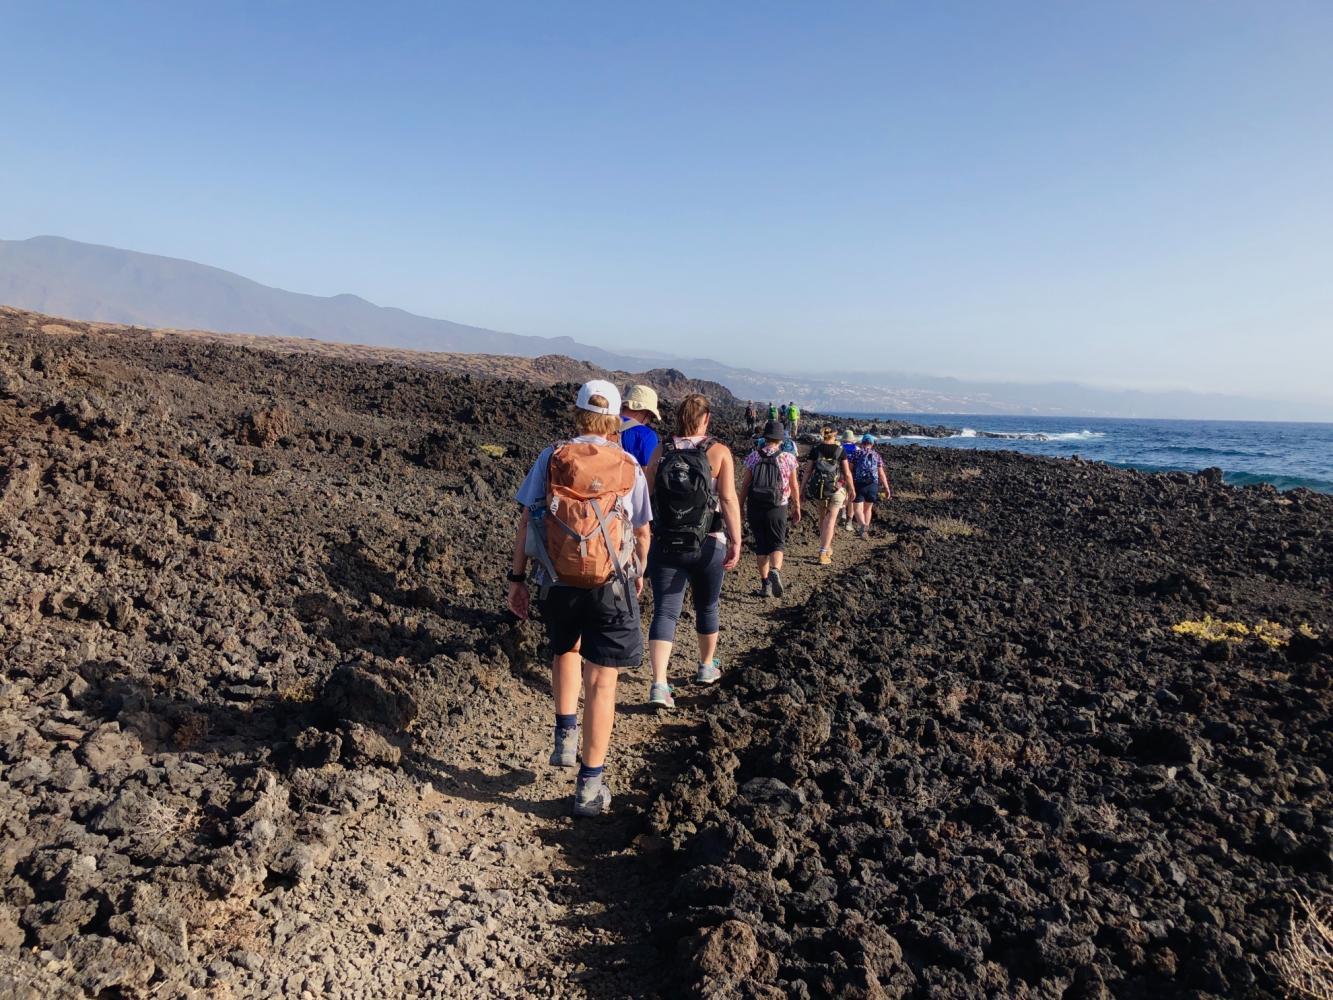 sentier bord de mer randonnée île